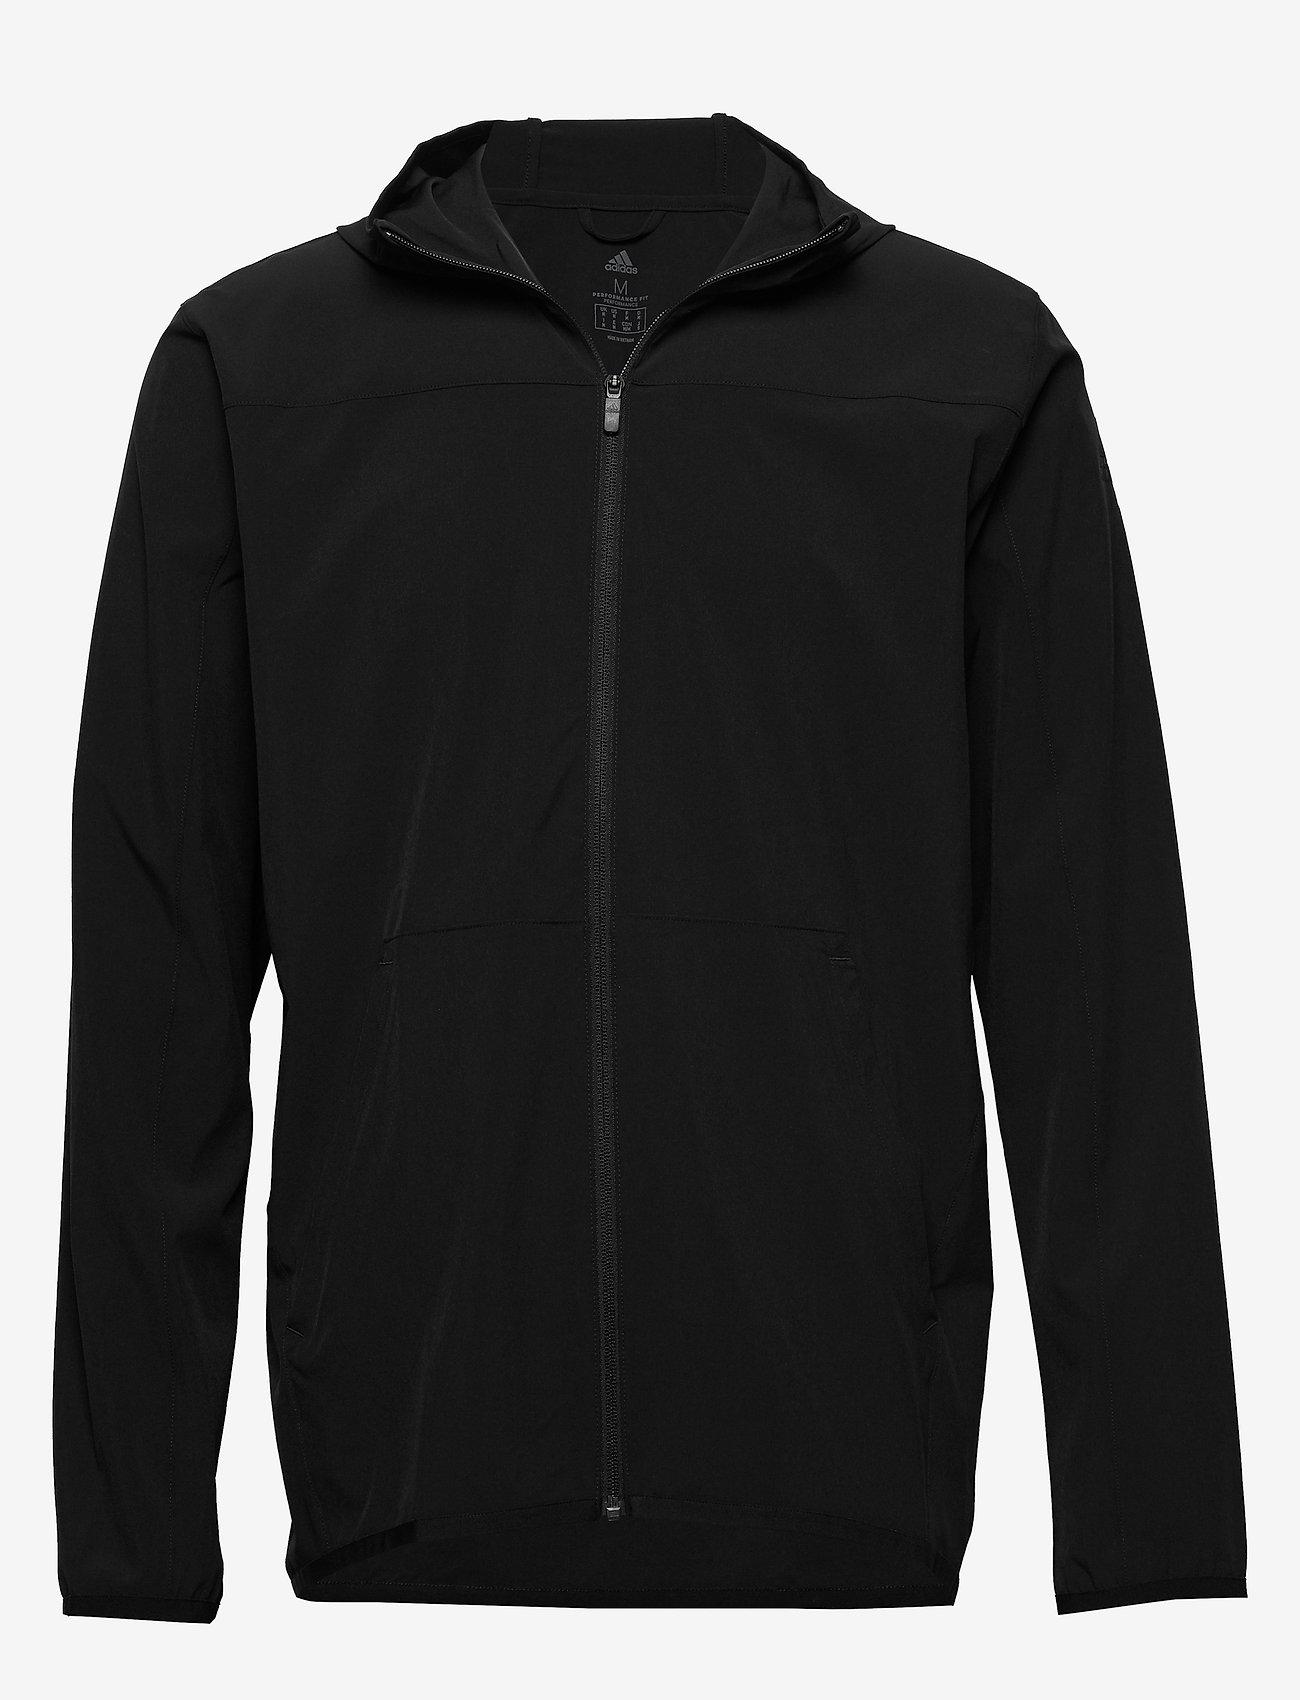 adidas Performance - CITY WV F/Z HD - sweats basiques - black - 1